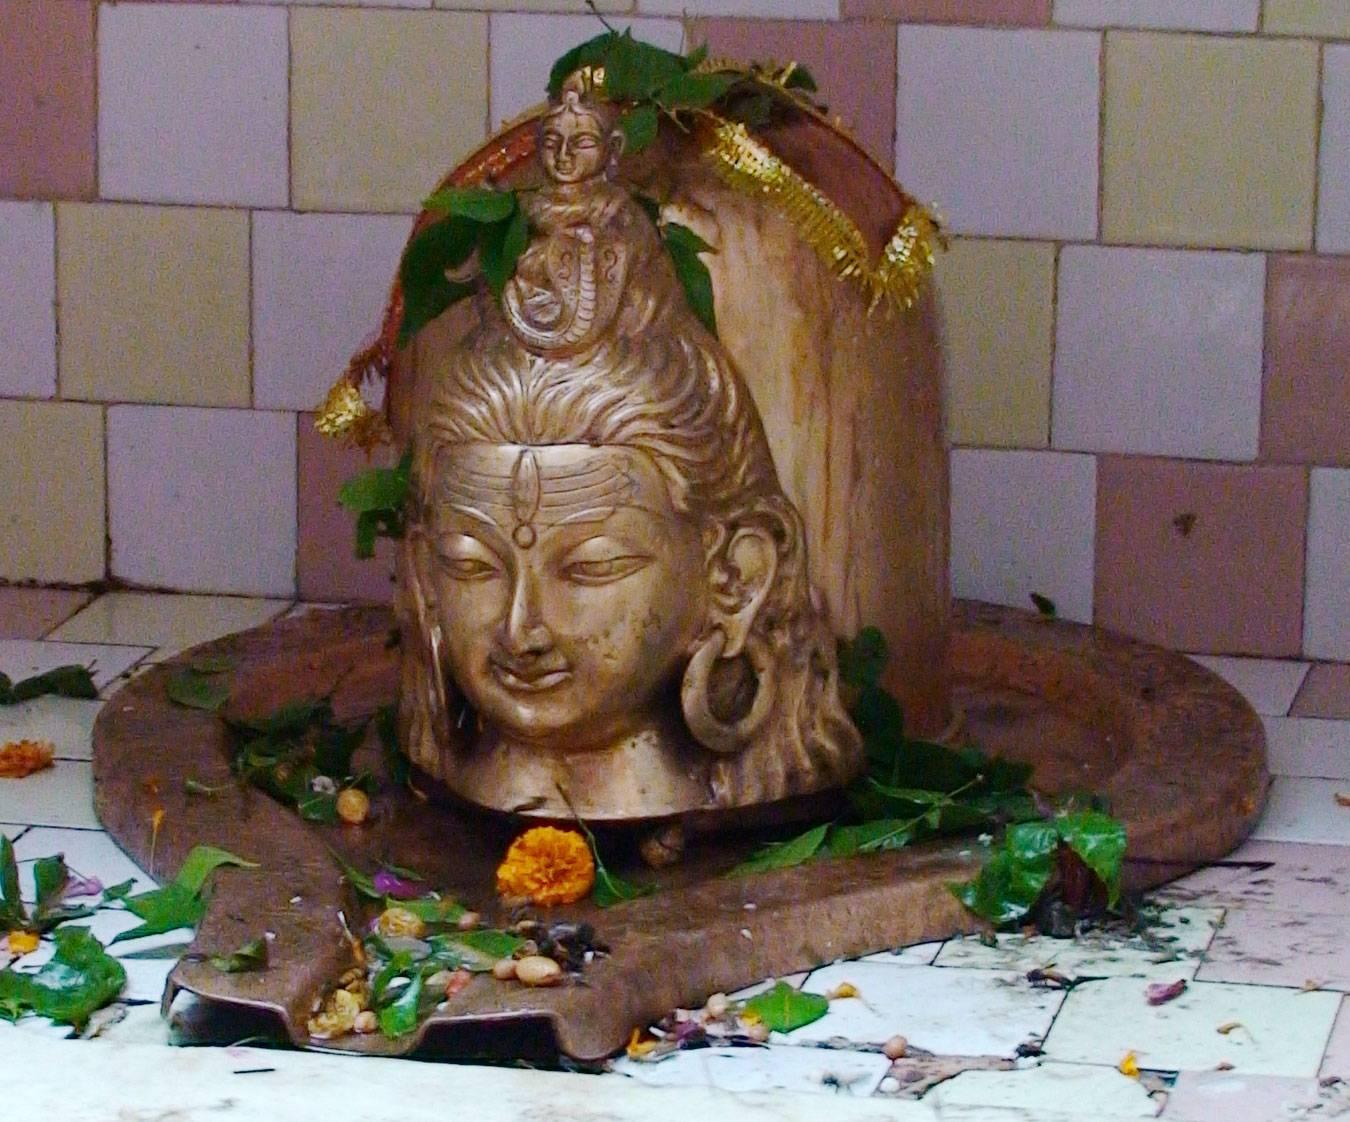 http://1.bp.blogspot.com/_tg42ArcfTzU/TEnB_zLOqoI/AAAAAAAAAss/_VHa9wT6n8Q/s1600/Shiva-Linga+pictures.jpg